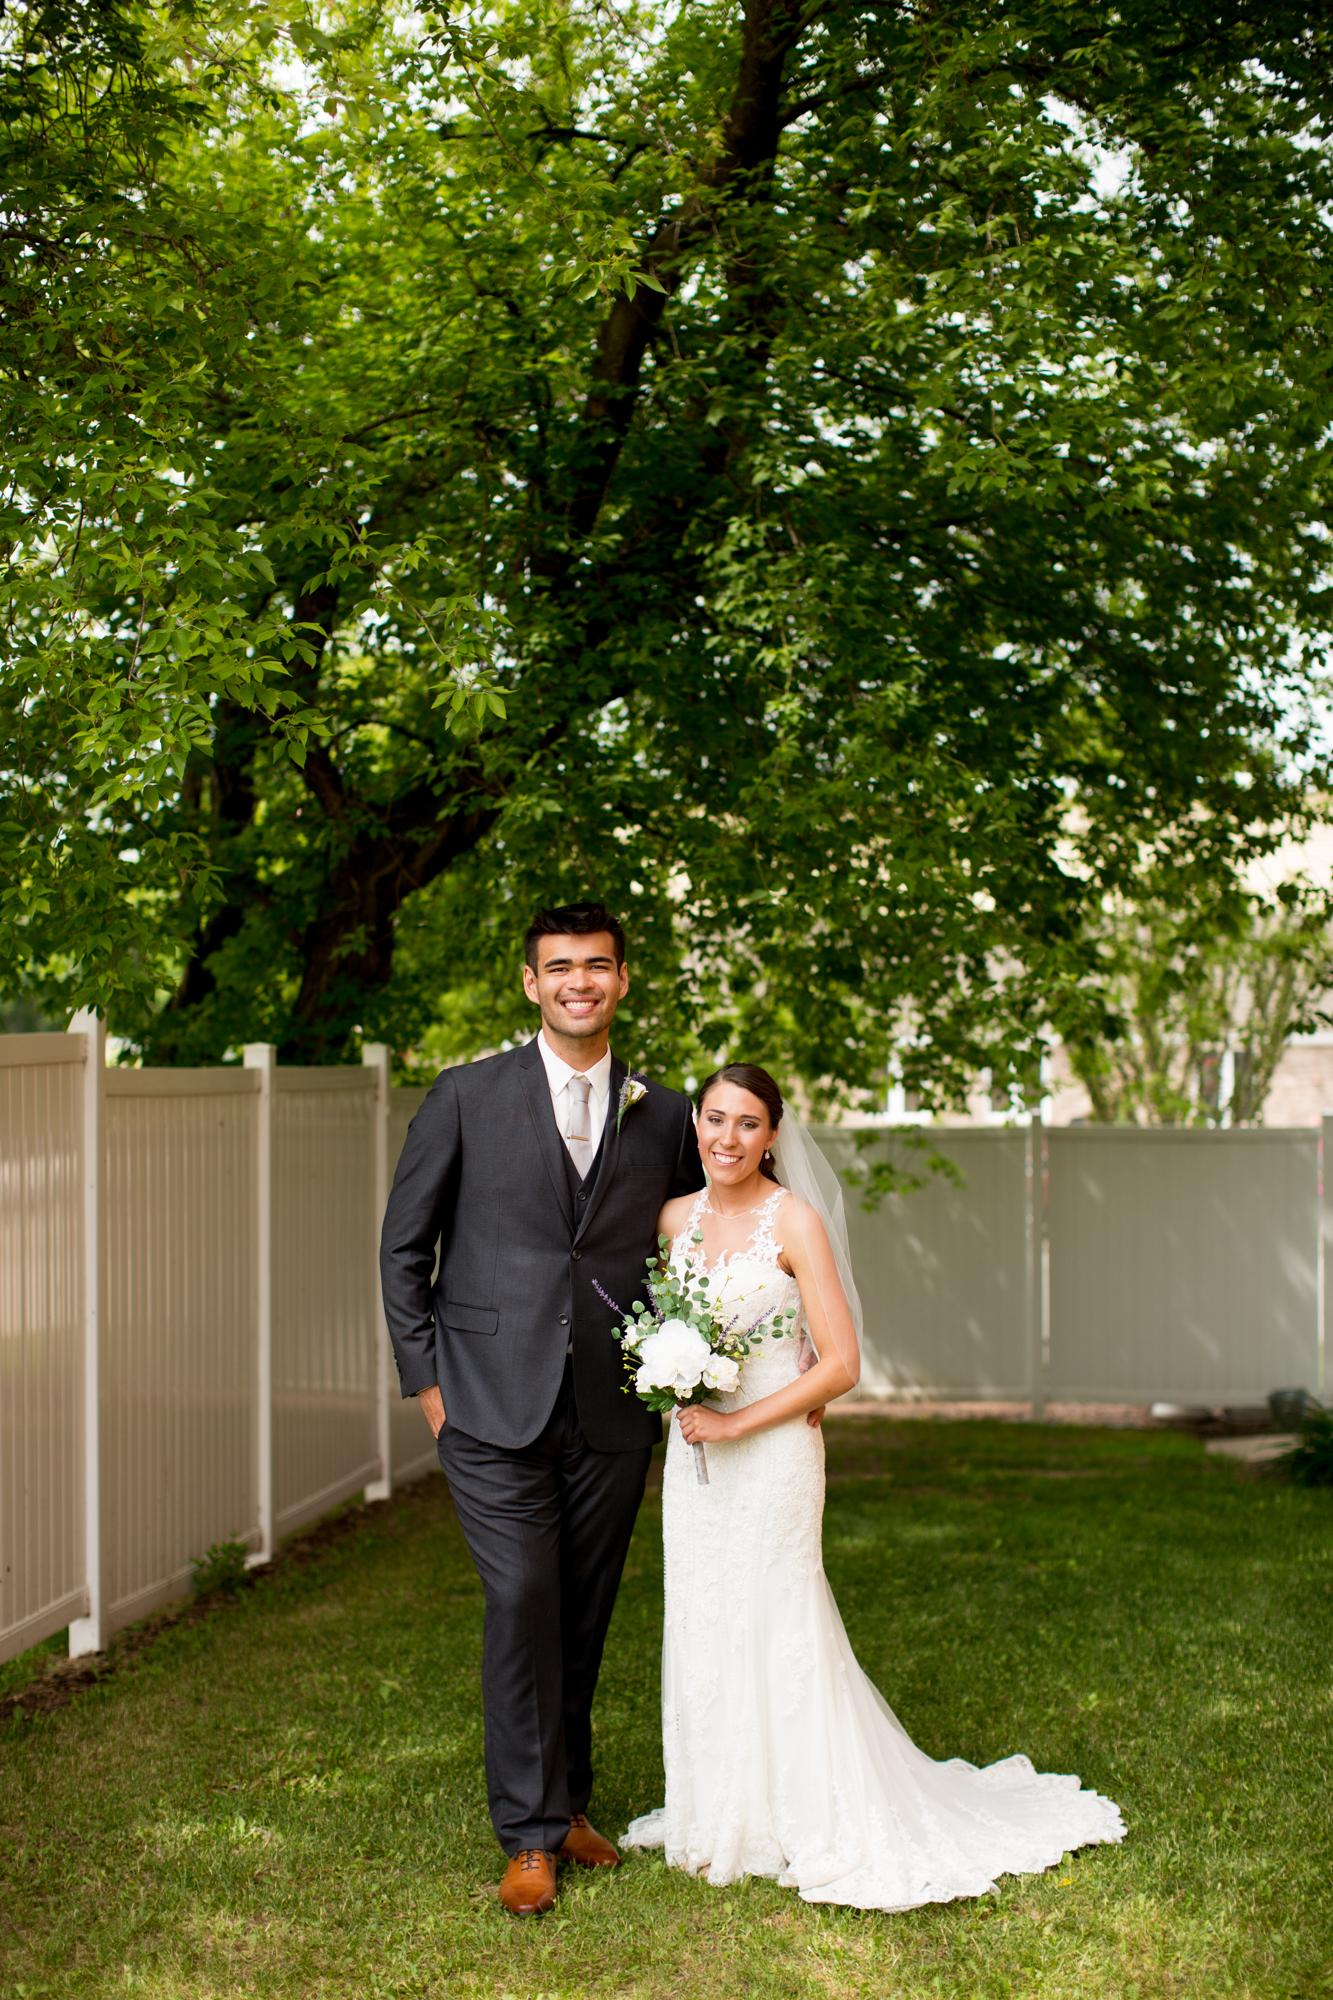 Olde 41 Green Bay Wisconsin Wedding - Whit Meza Photography